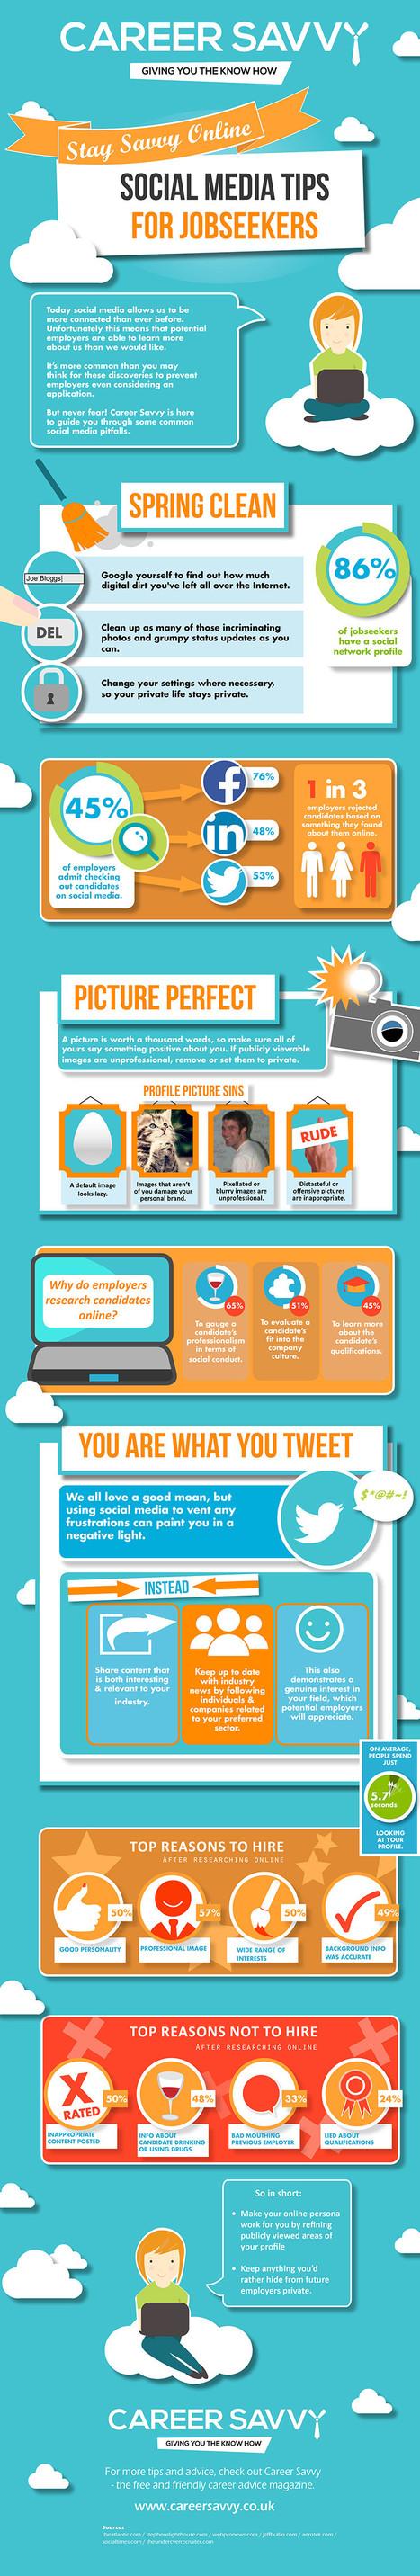 Social Media Tips For Job Seekers | Personal Reputation | Scoop.it